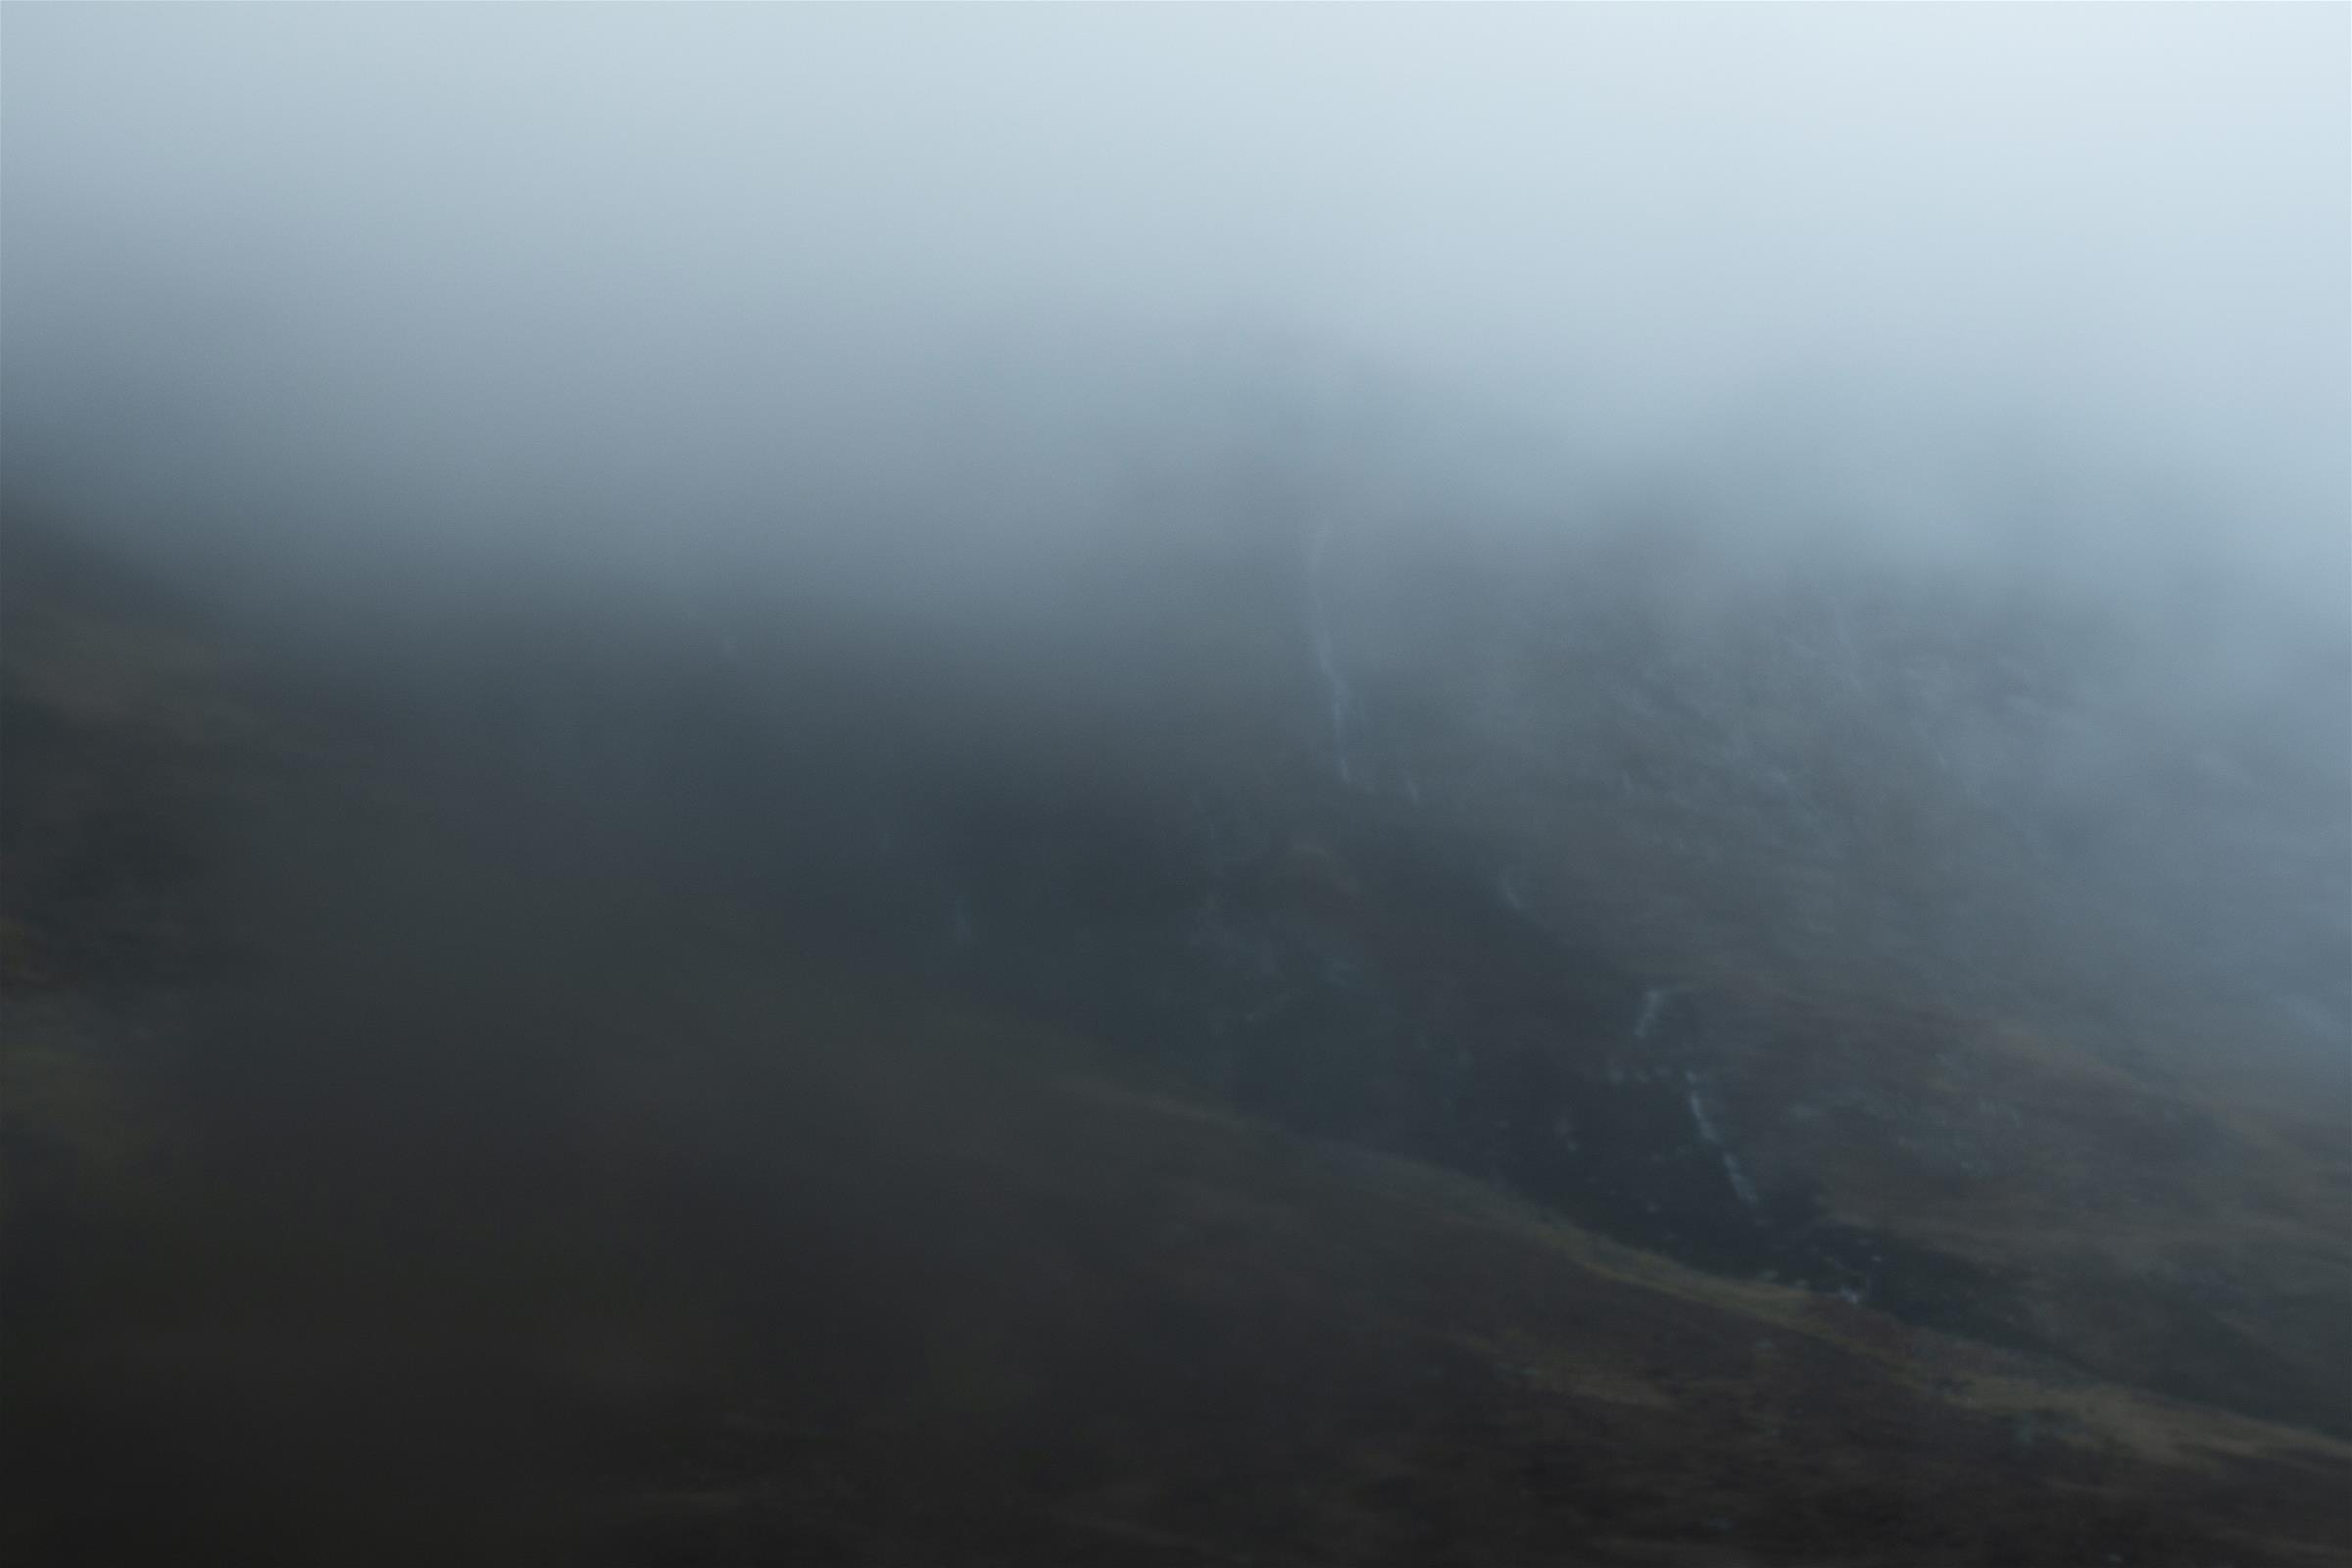 The Mist of Lewis